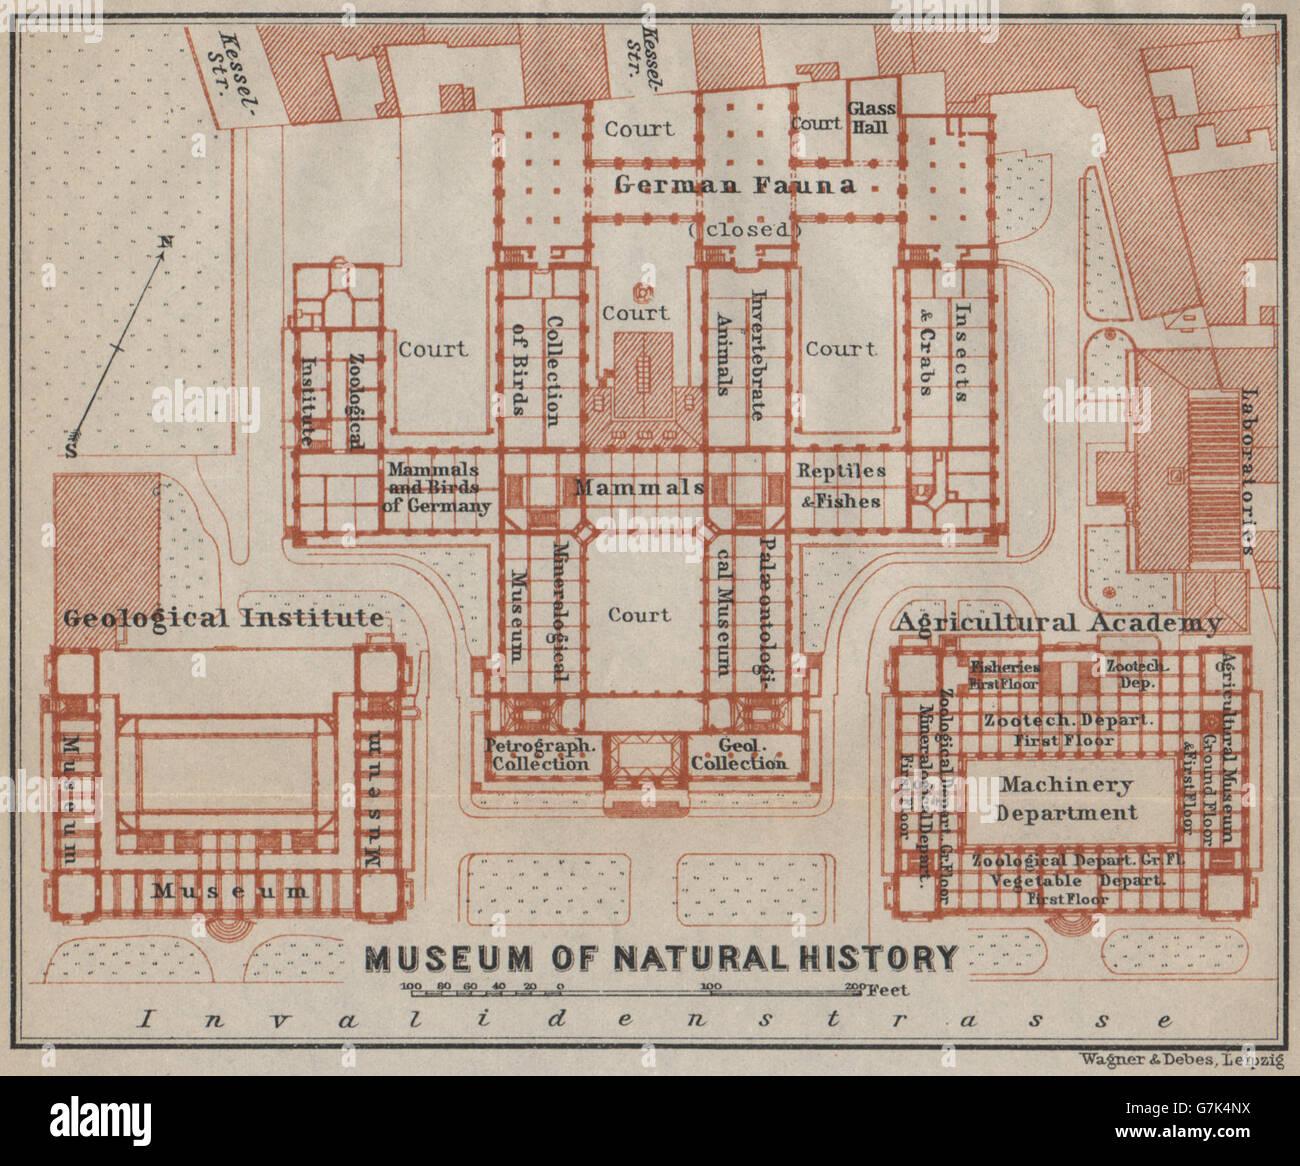 Natural History Museum Für Naturkunde Berlin Floor Plan Karte 1923 Old Map Stock Photo Alamy